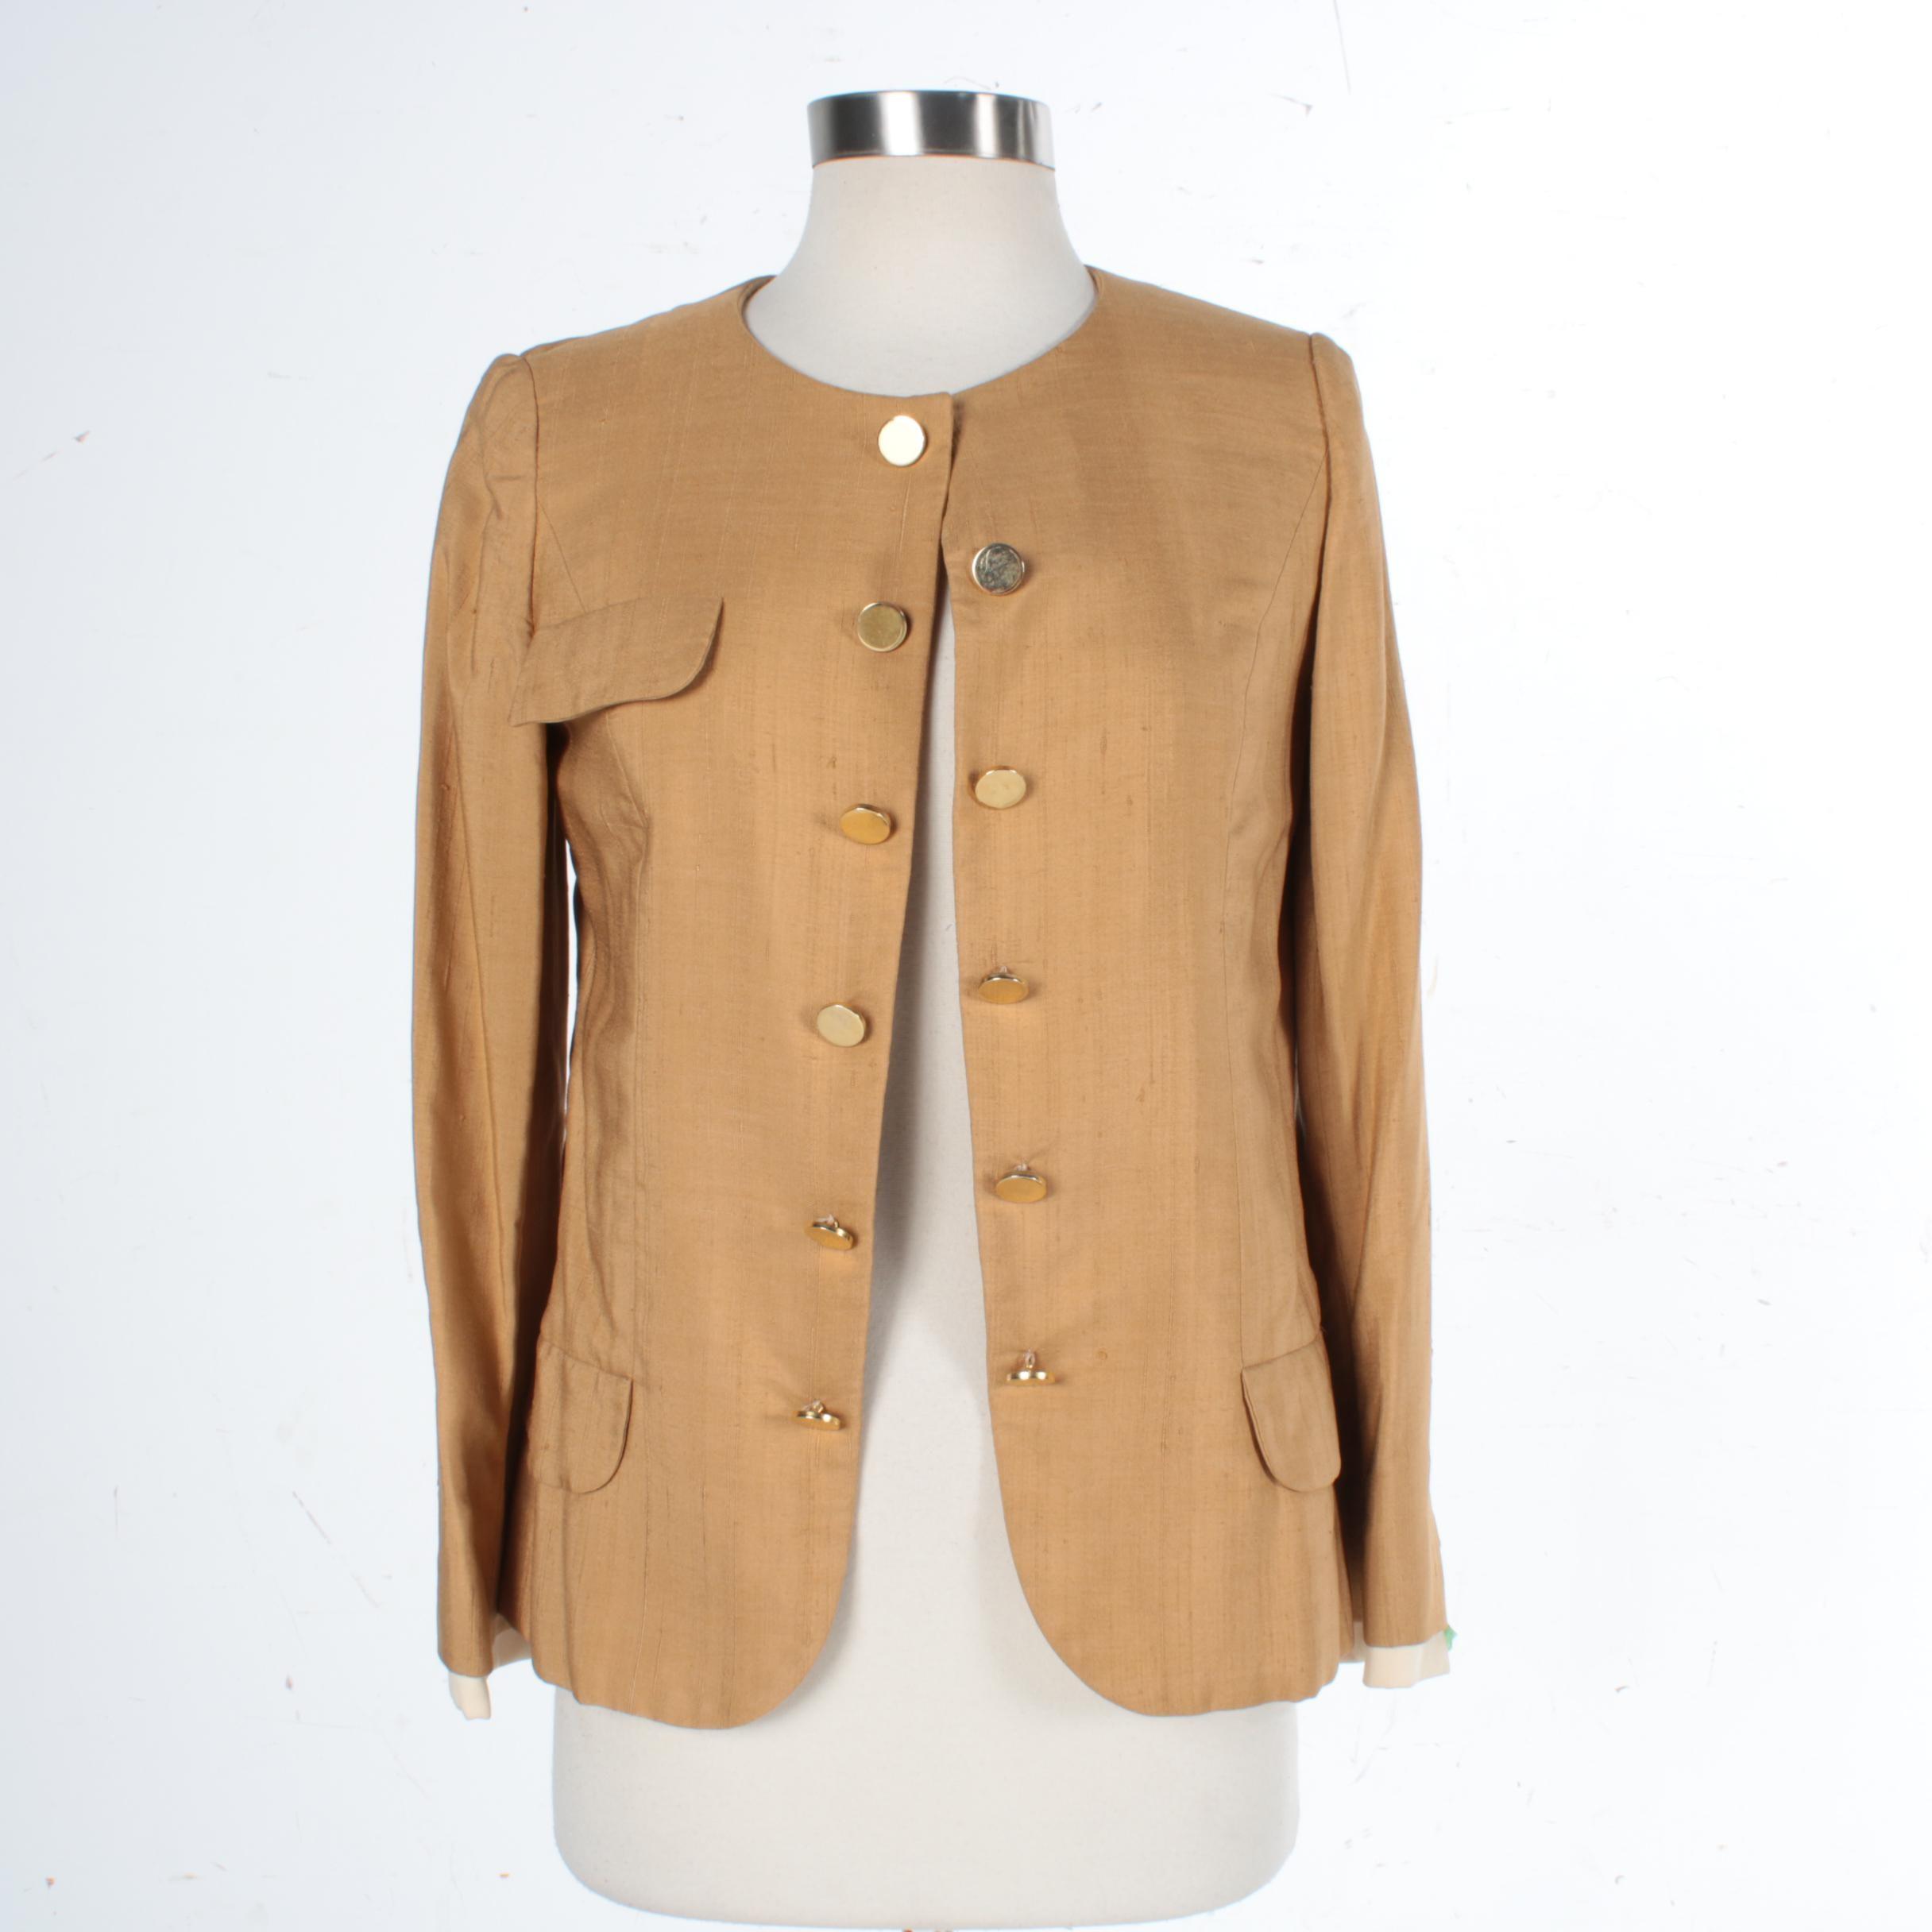 Women's Vintage Cardinali Jacket